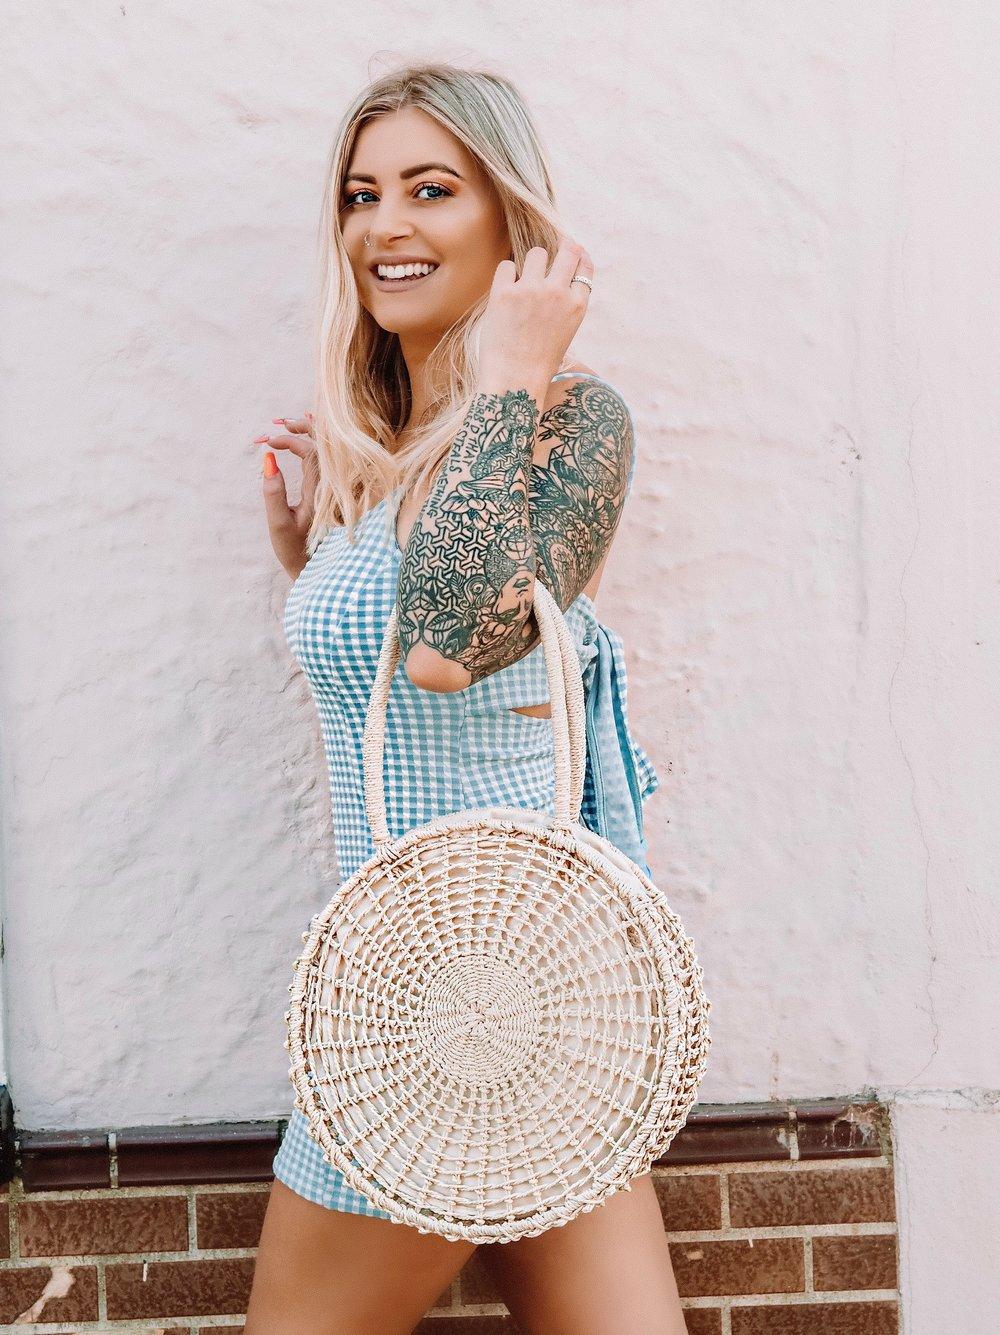 london brighton fashion blogger